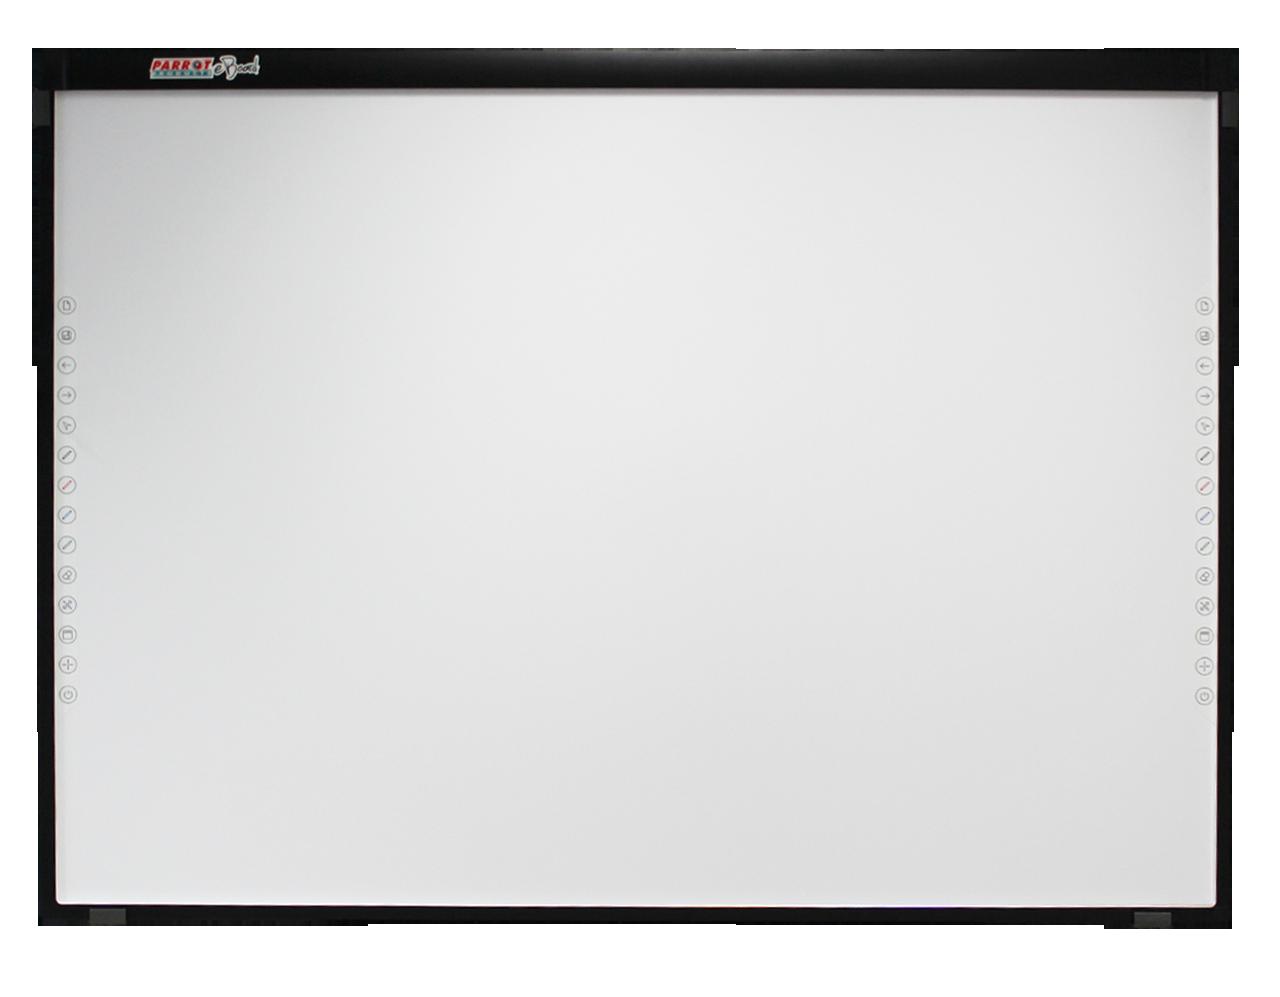 "Parrot 100"" Interactive Whiteboard Eboard Multit (2320*1434mm)"